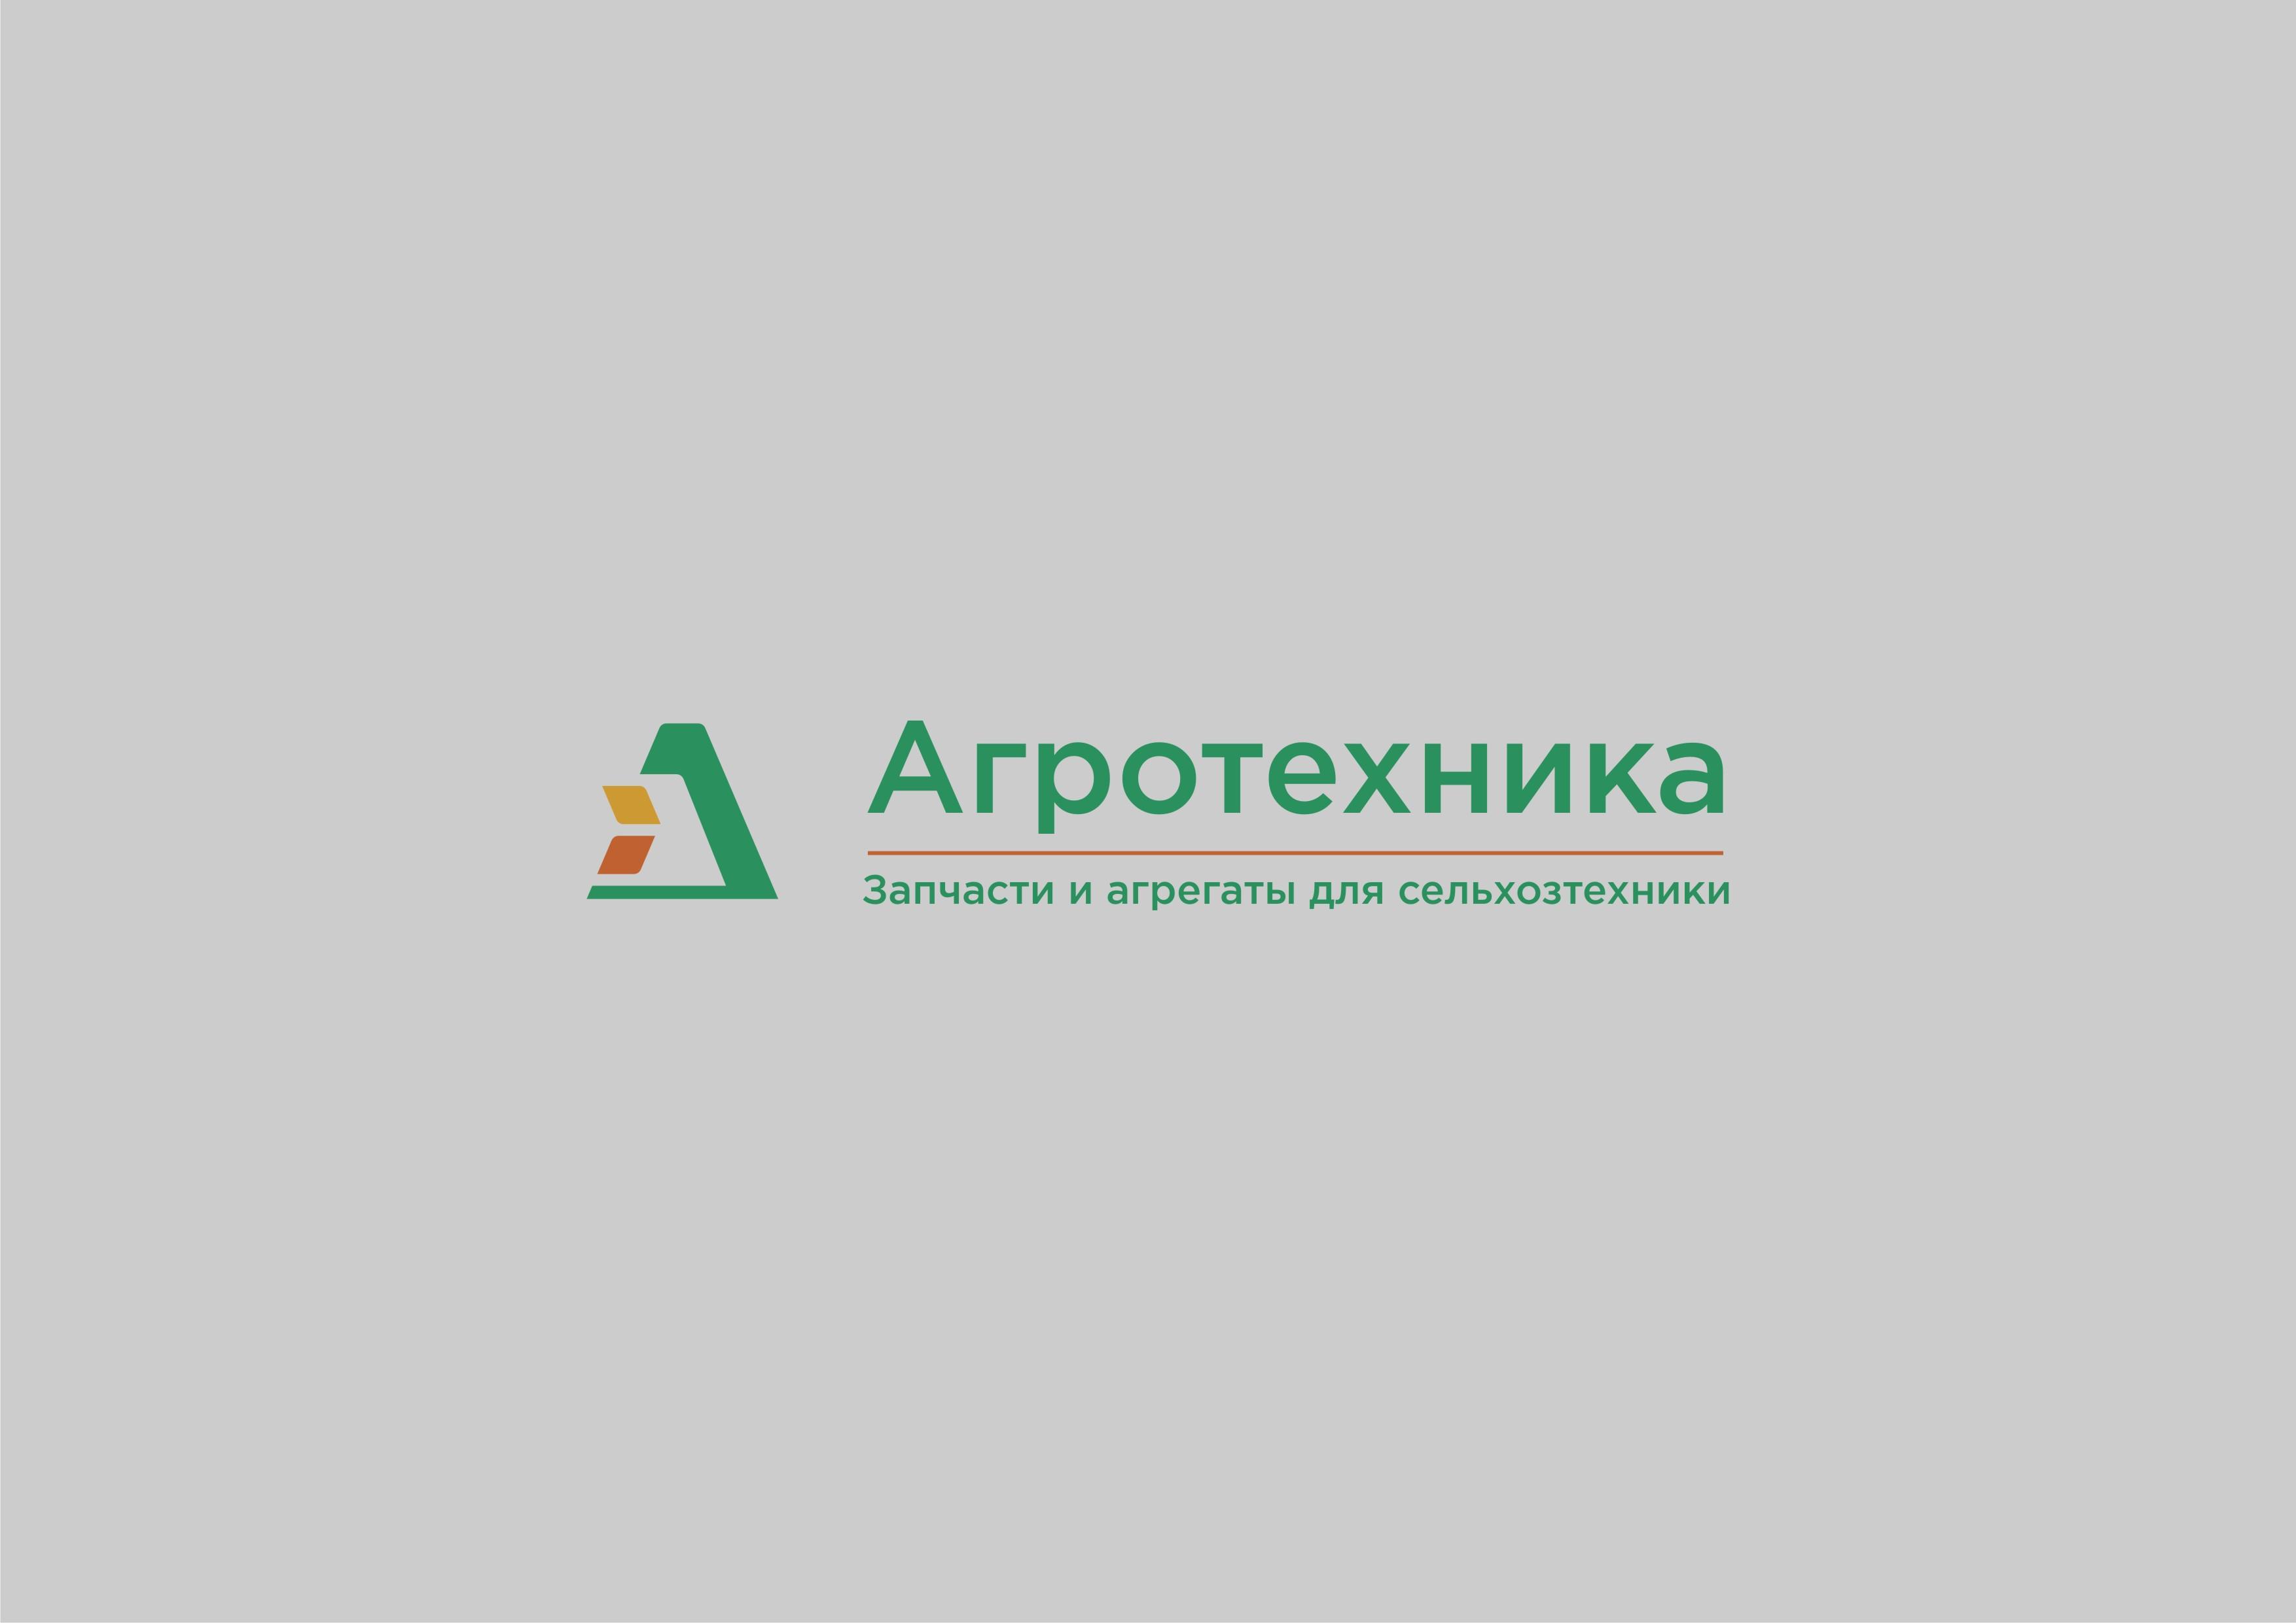 Разработка логотипа для компании Агротехника фото f_0385c0778e4b646e.jpg